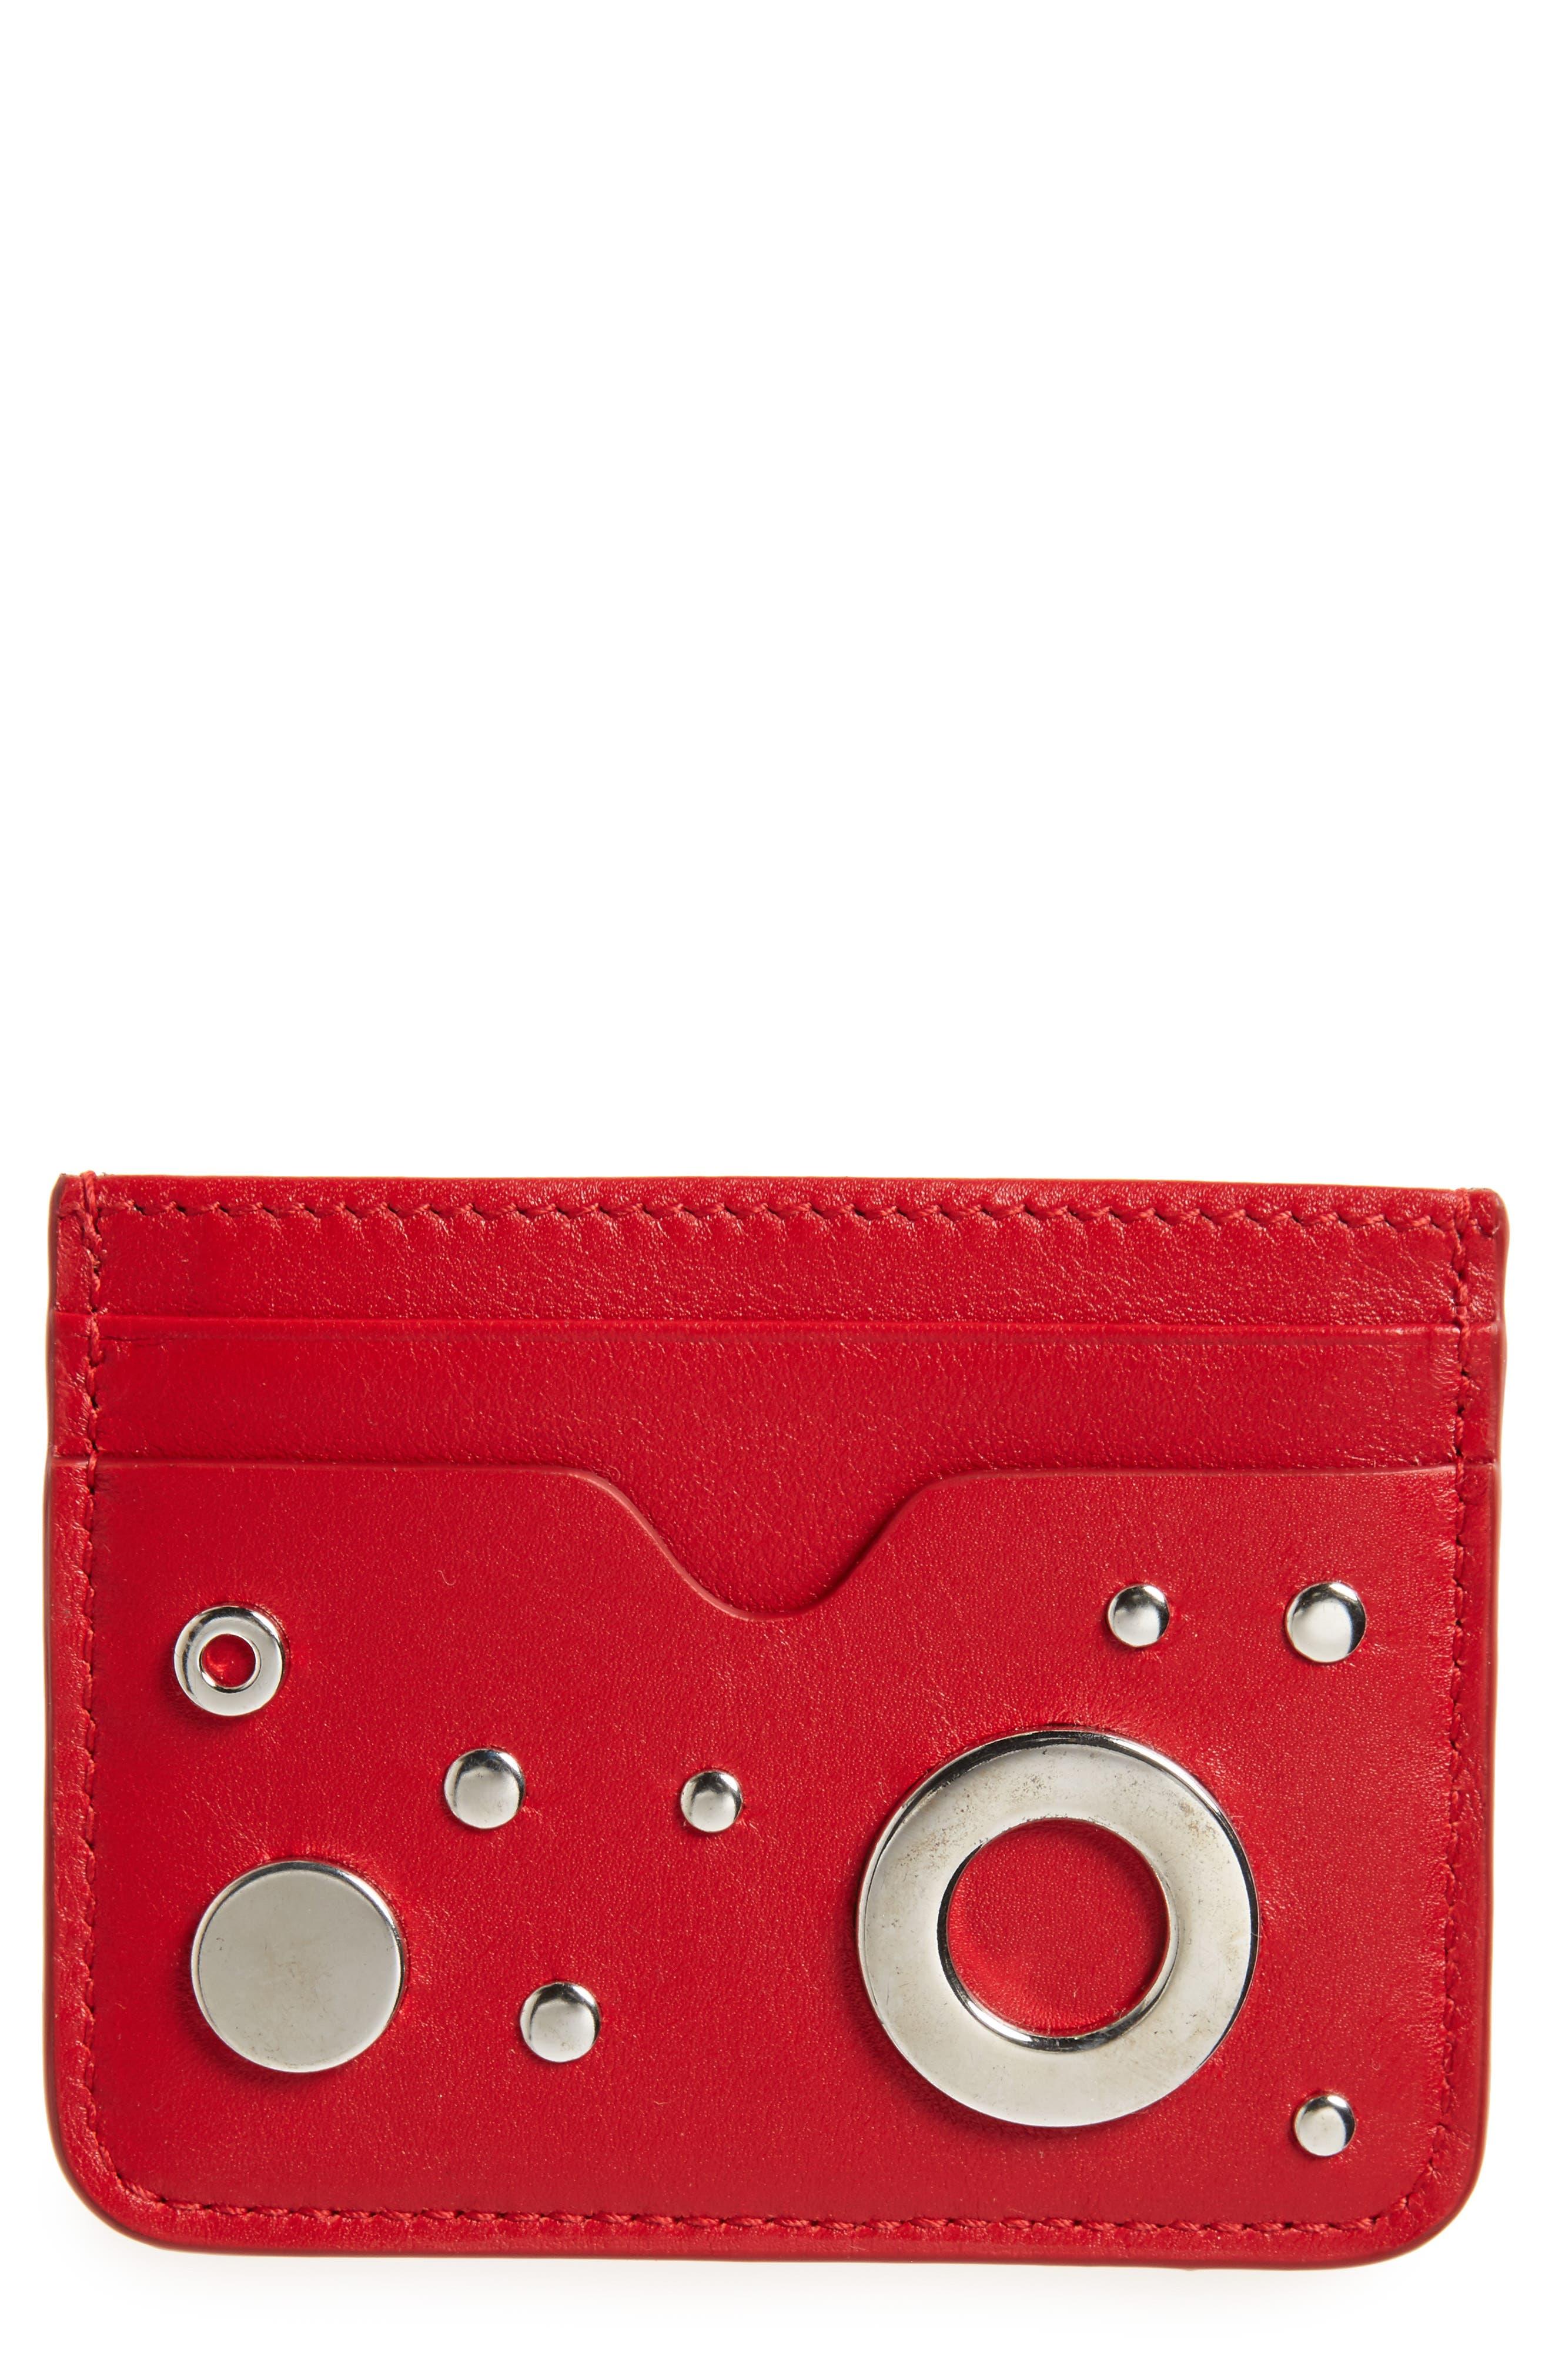 Grommet & Stud Calfskin Card Holder,                             Main thumbnail 1, color,                             649